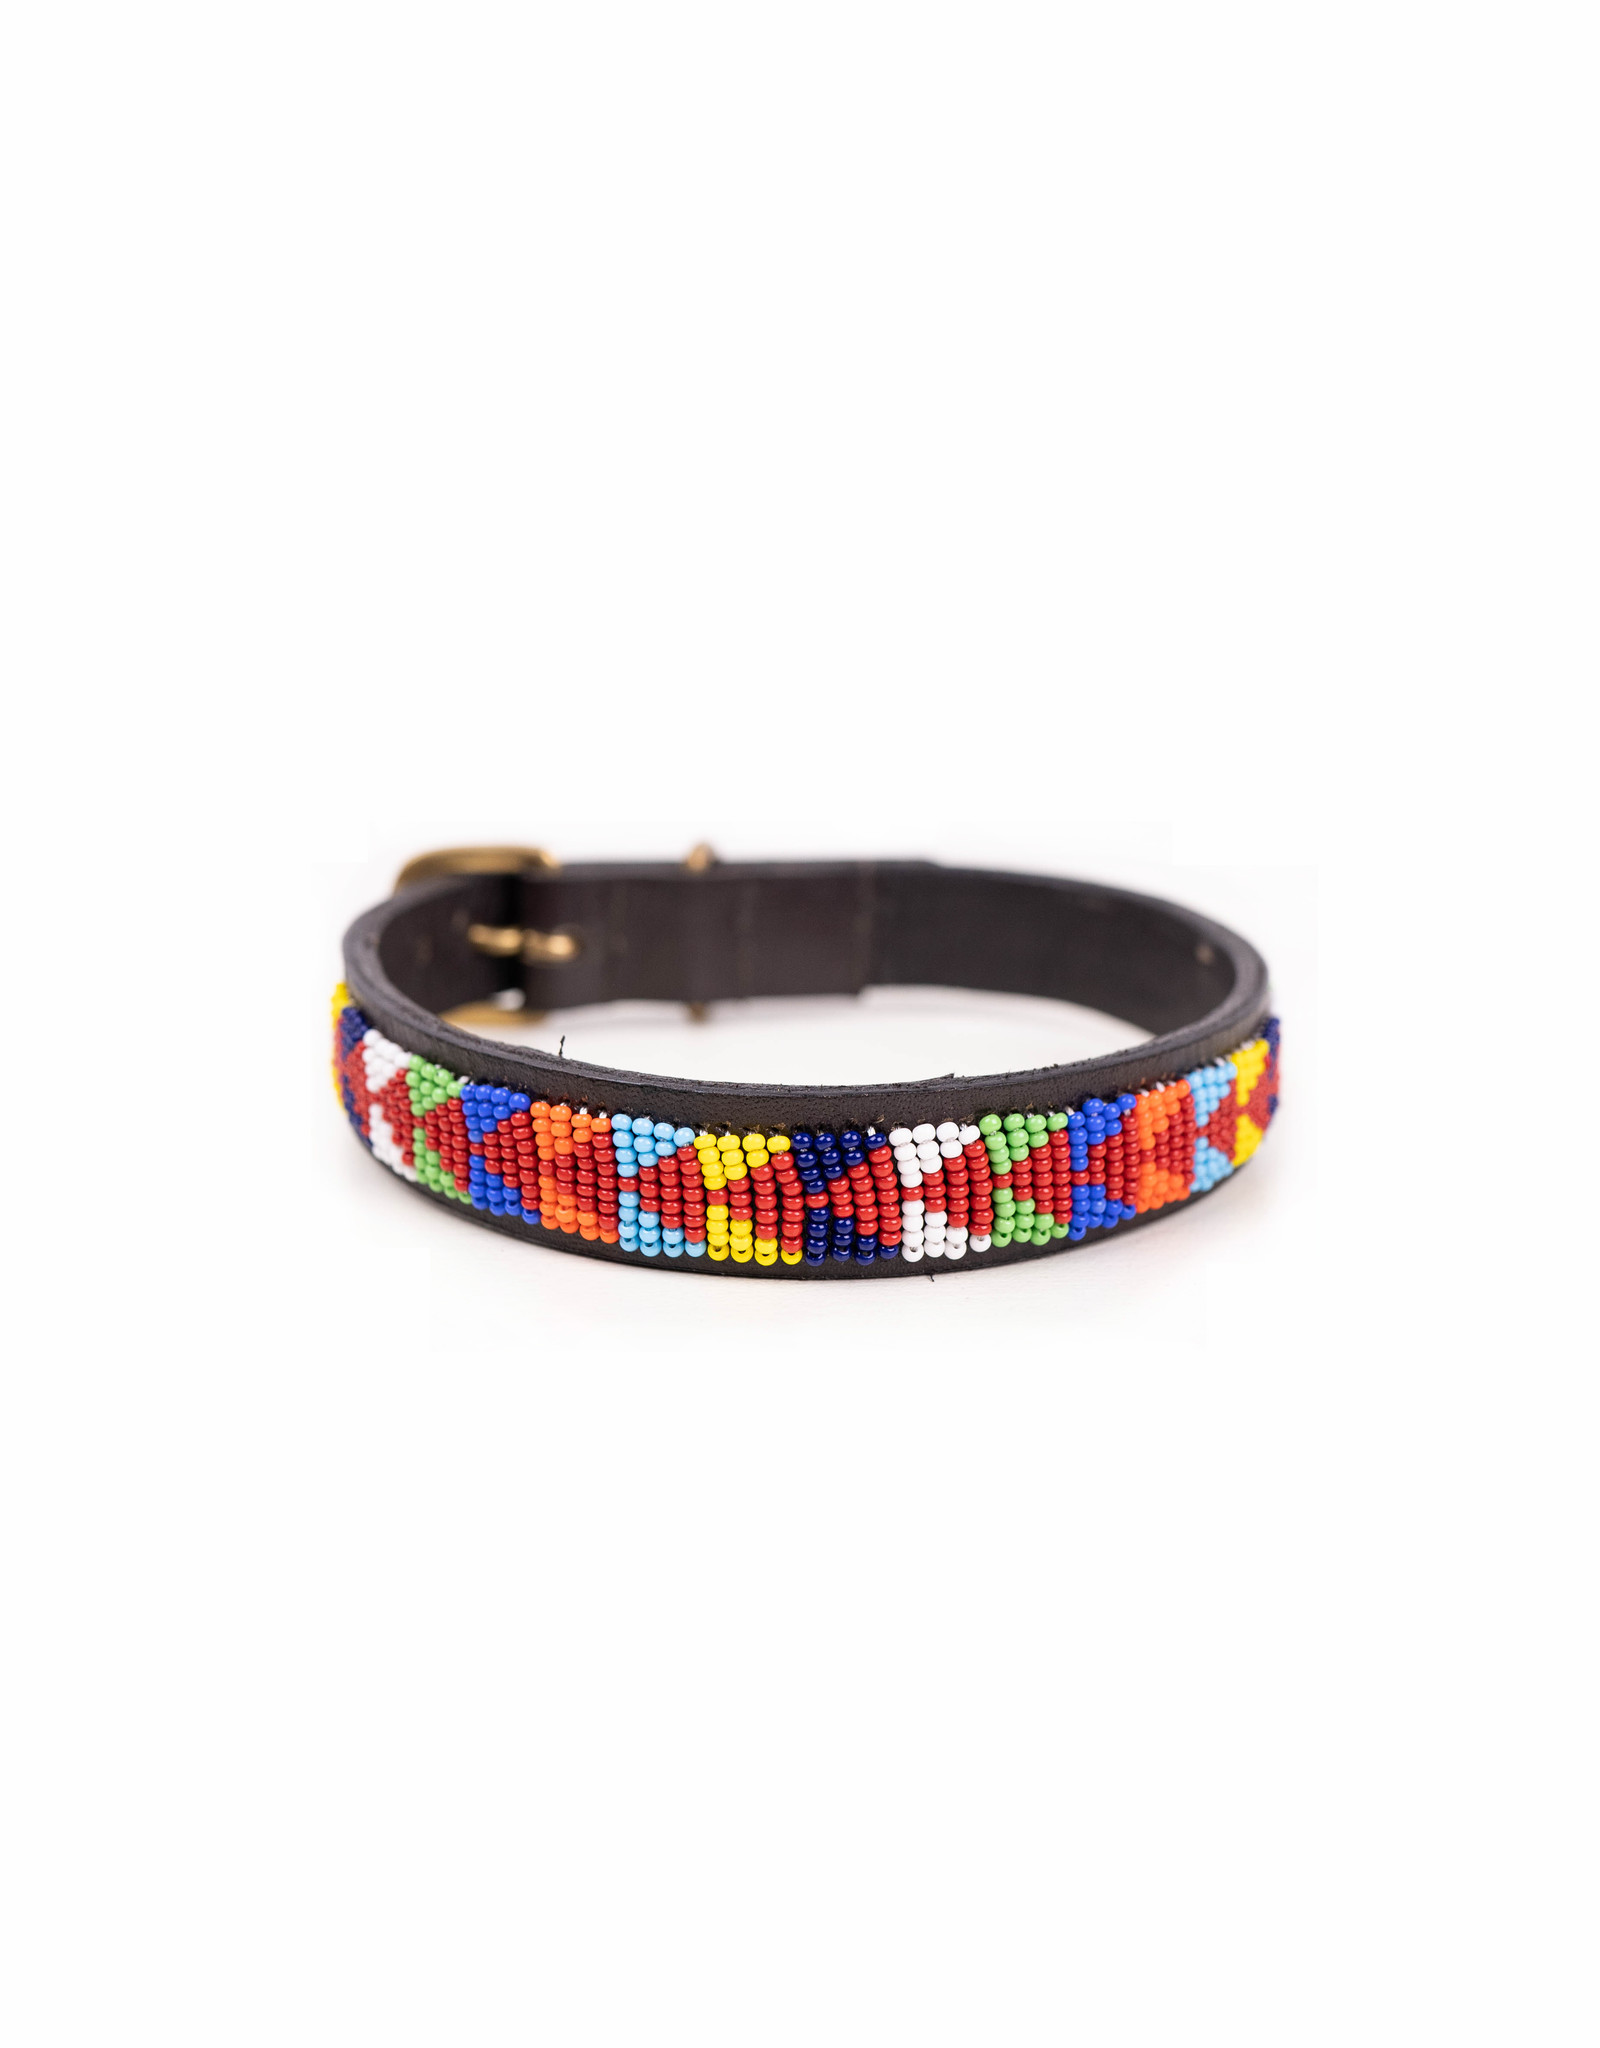 Maisha.Style Dog collar - Maasai red arrows on brown leather- Copy